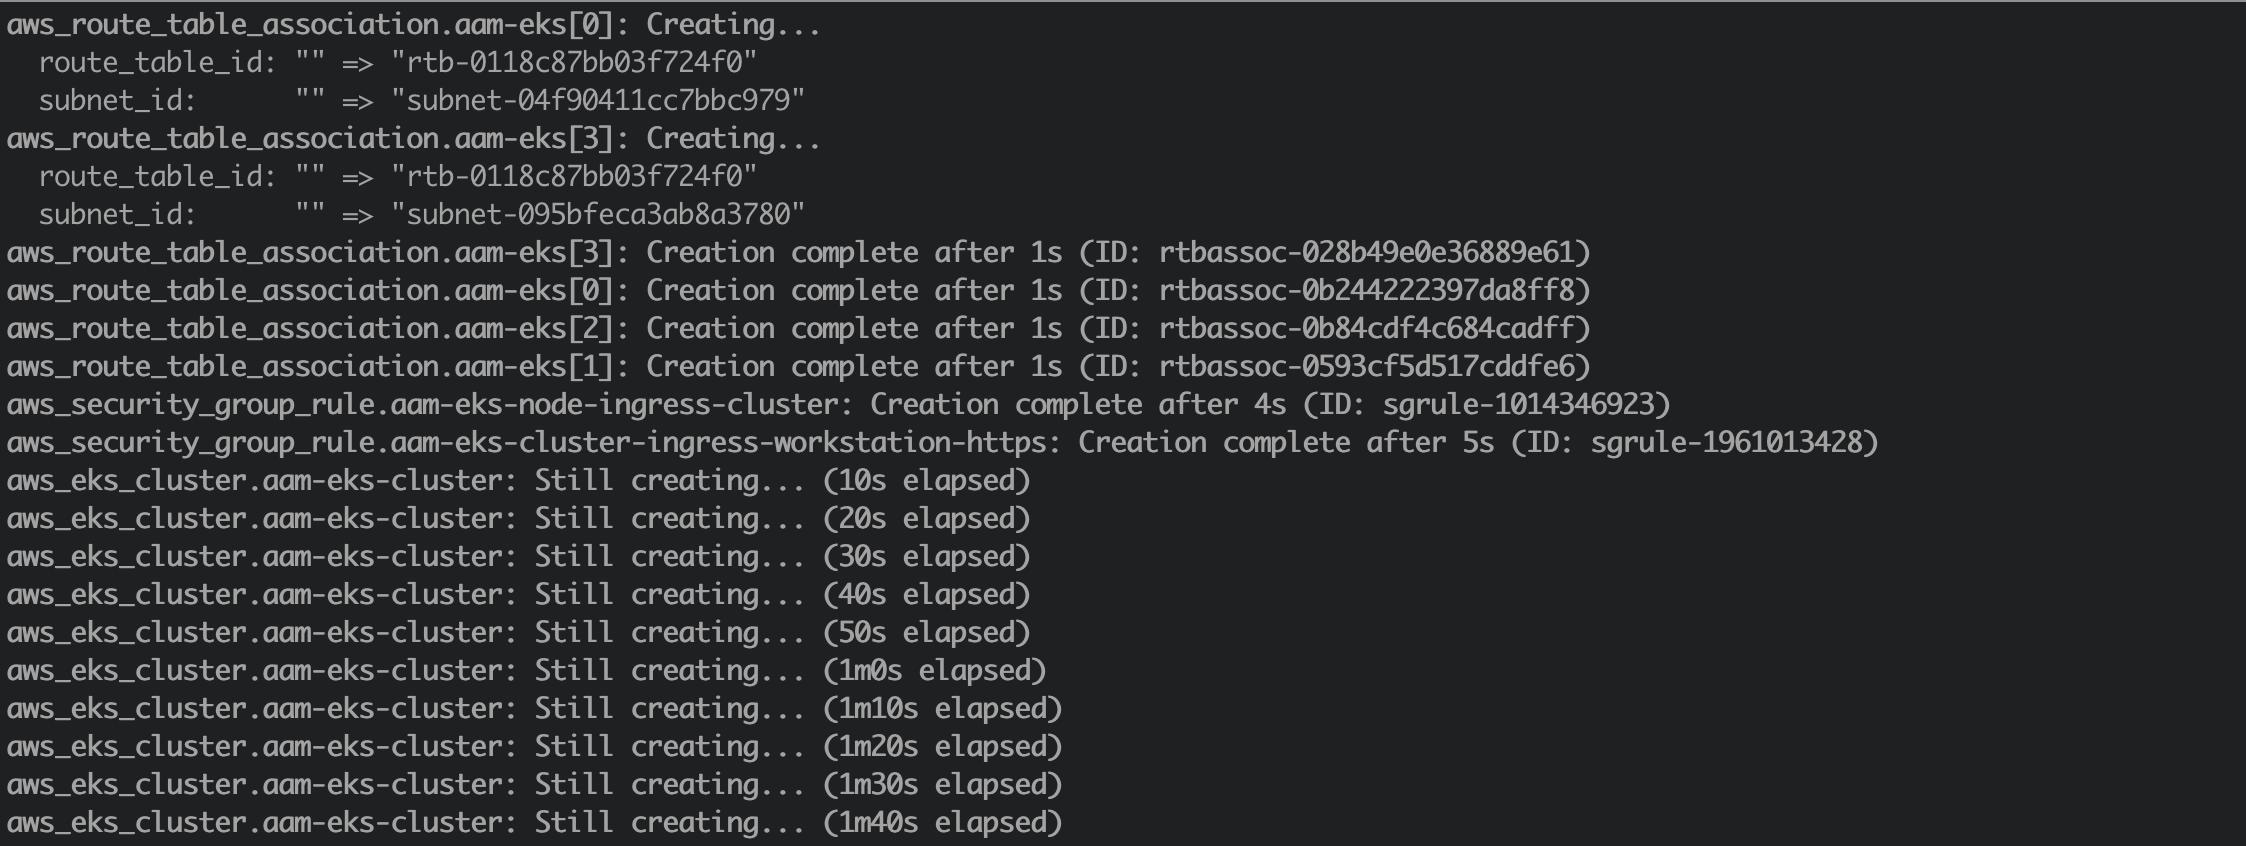 ops-cli/examples/aws-kubernetes at master · adobe/ops-cli